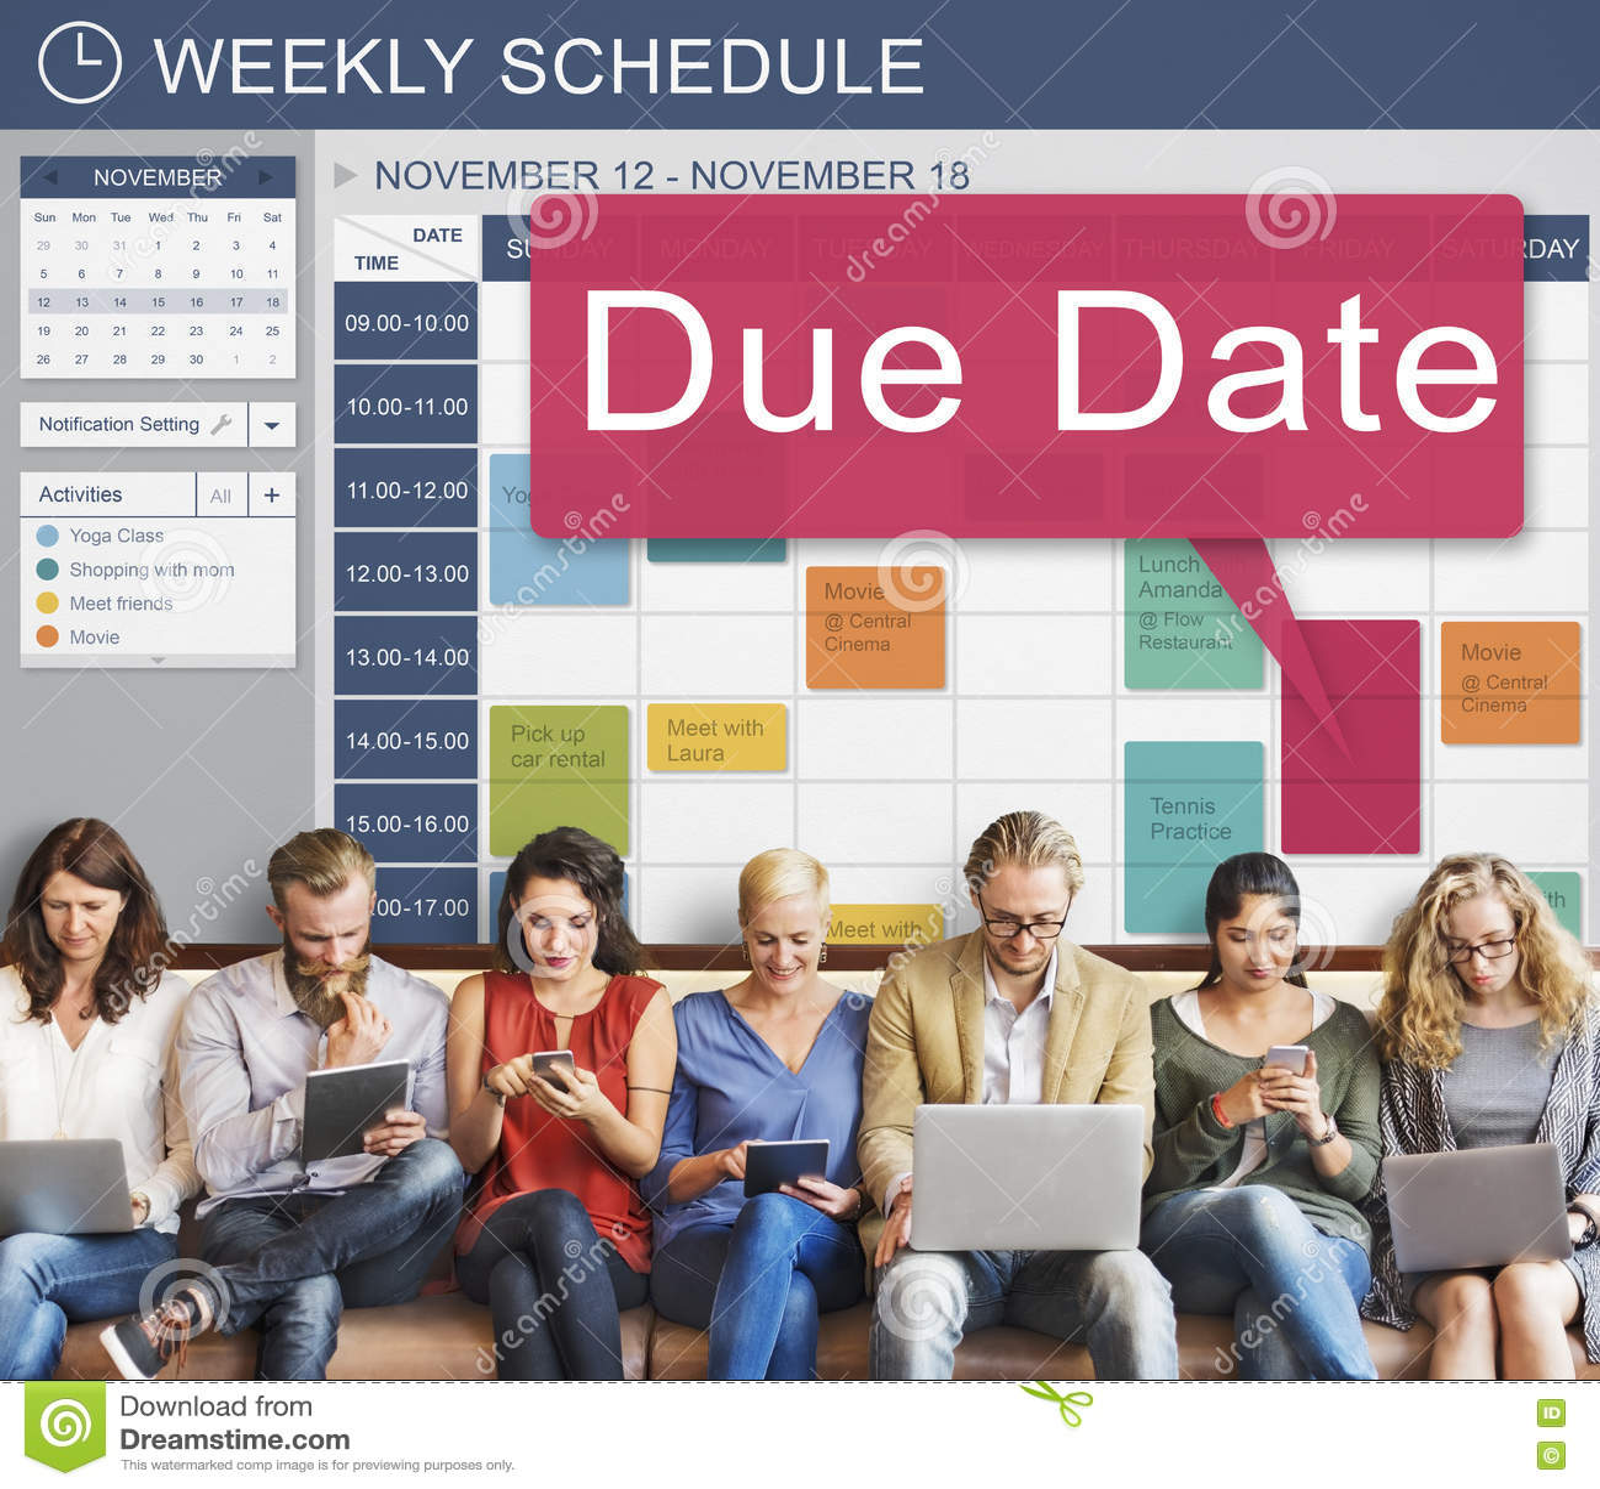 due date deadline schedule calendar reminder to do concept royalty free stock image. Black Bedroom Furniture Sets. Home Design Ideas